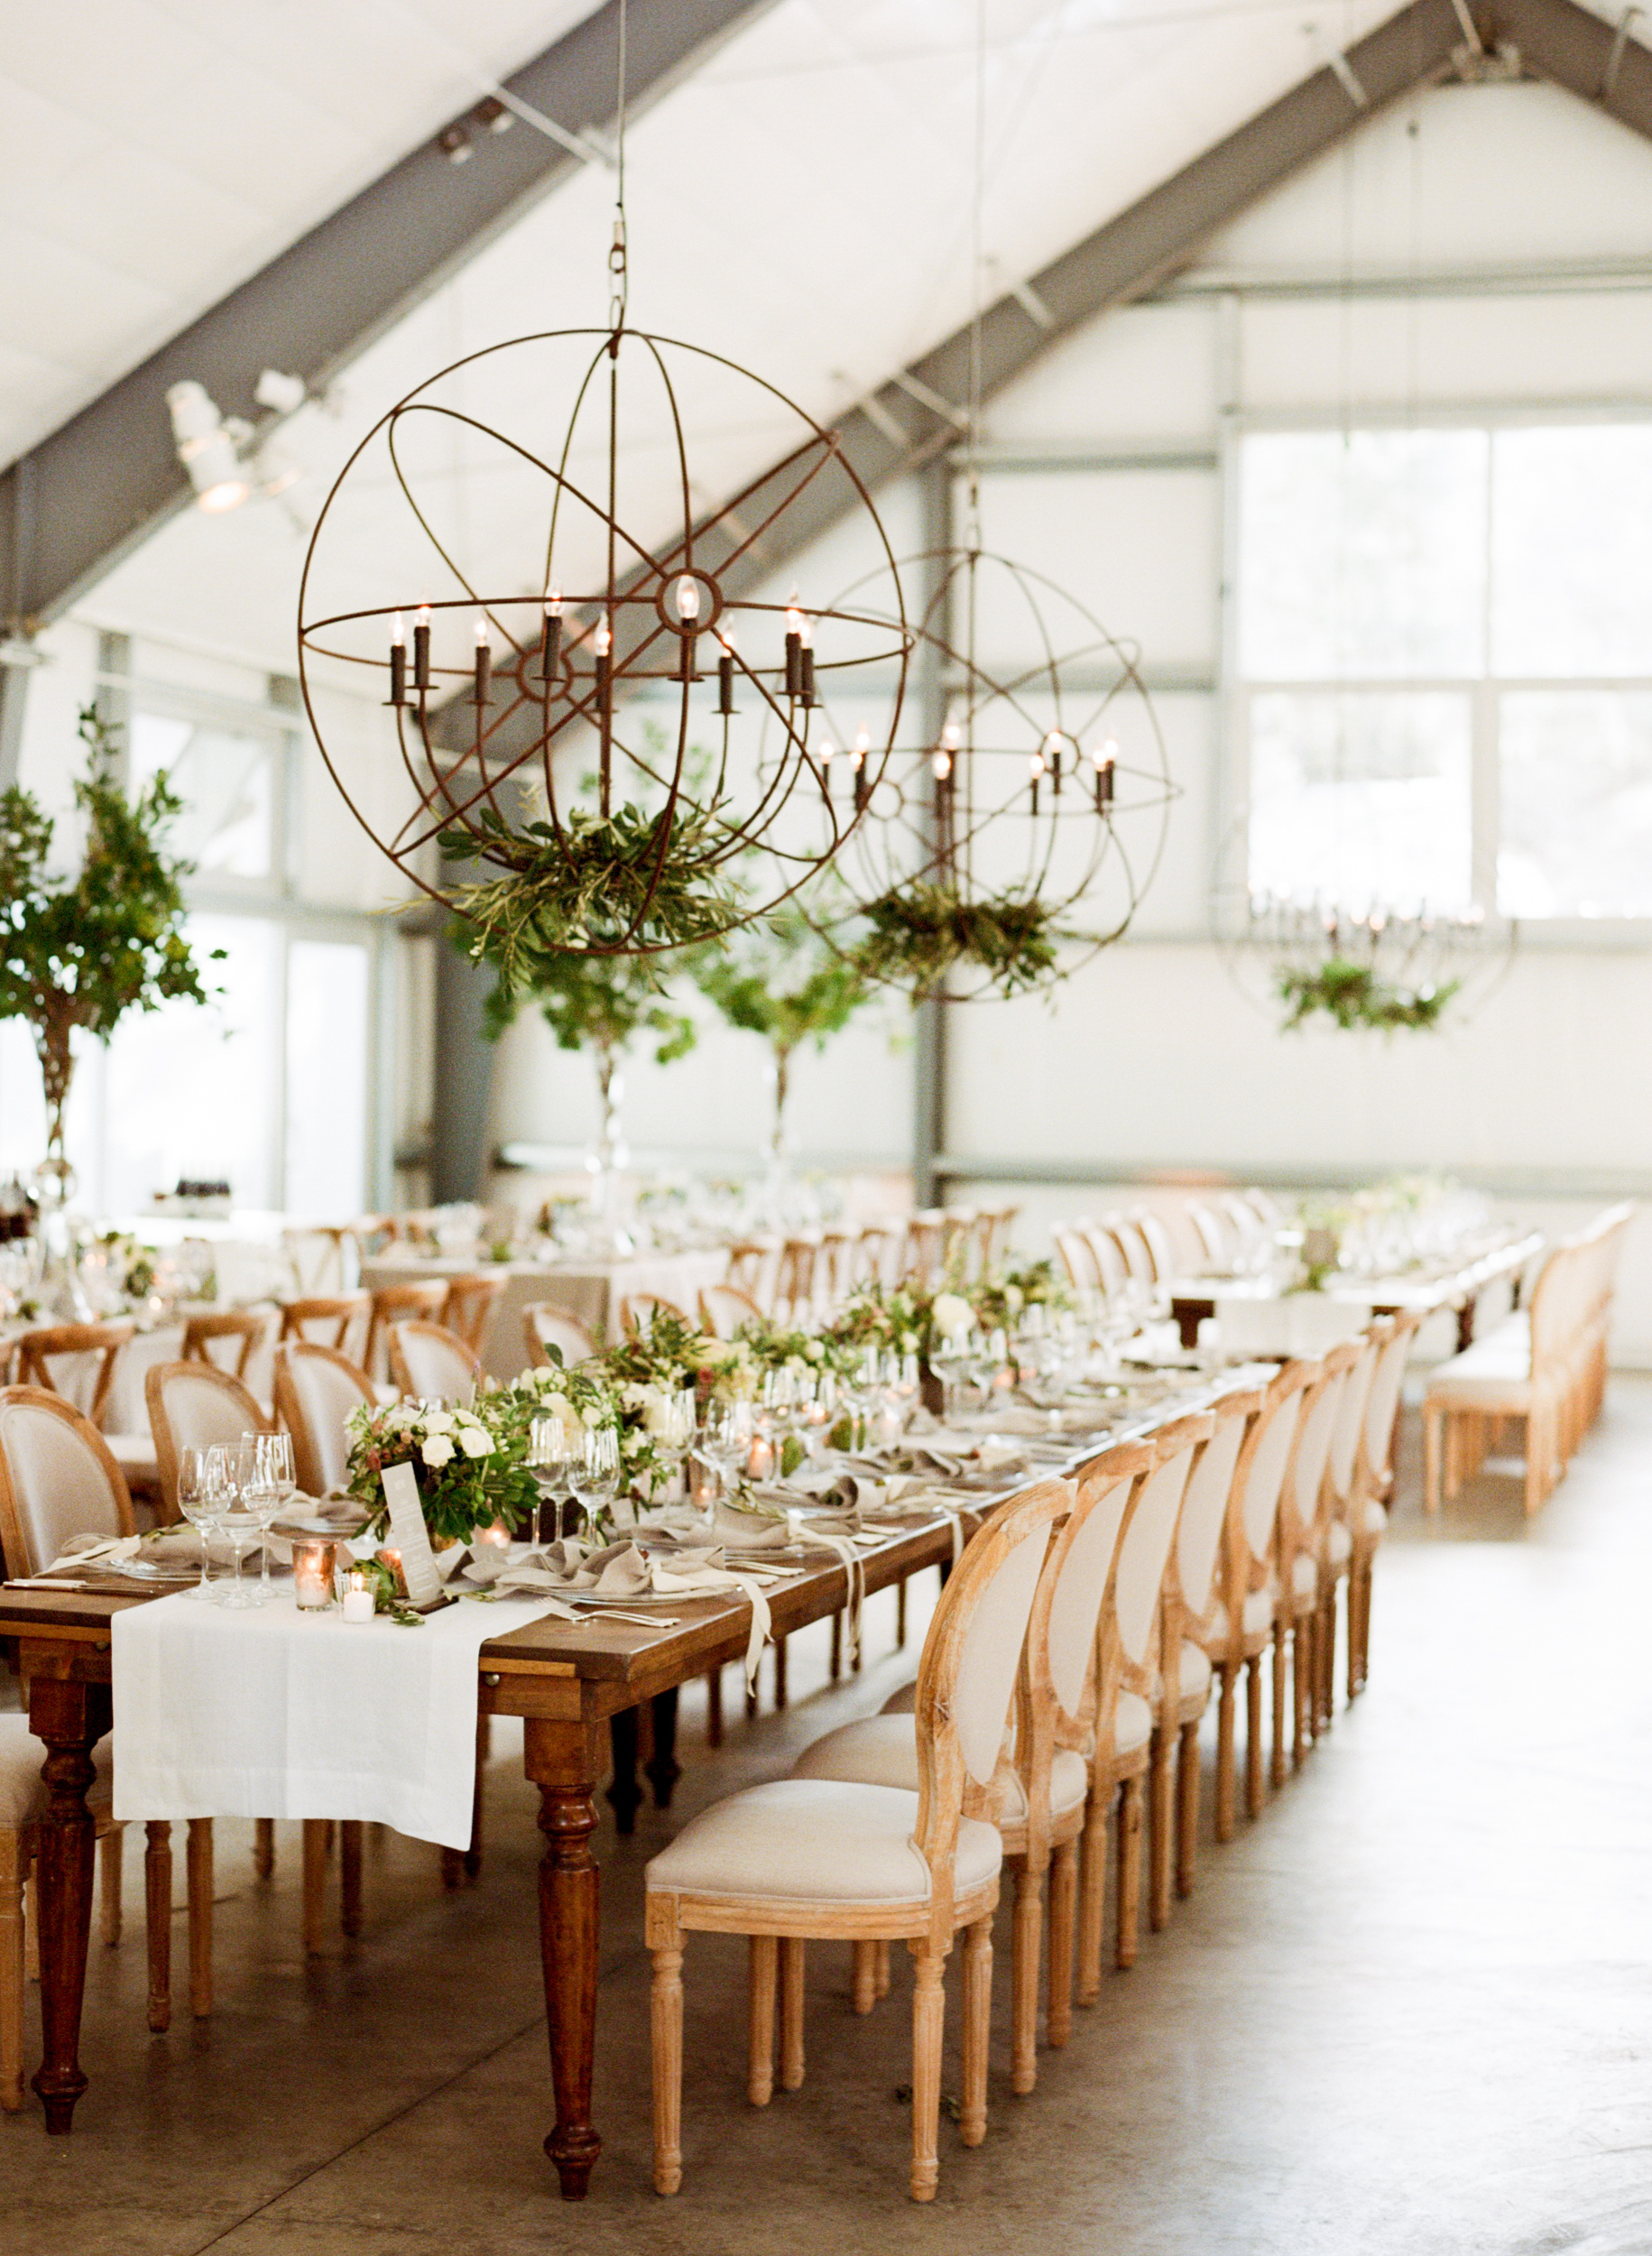 SylvieGil-Durham-Ranch-Organic-Ethereal-Rustic-Chandelier-Industrial-Chic-Wedding